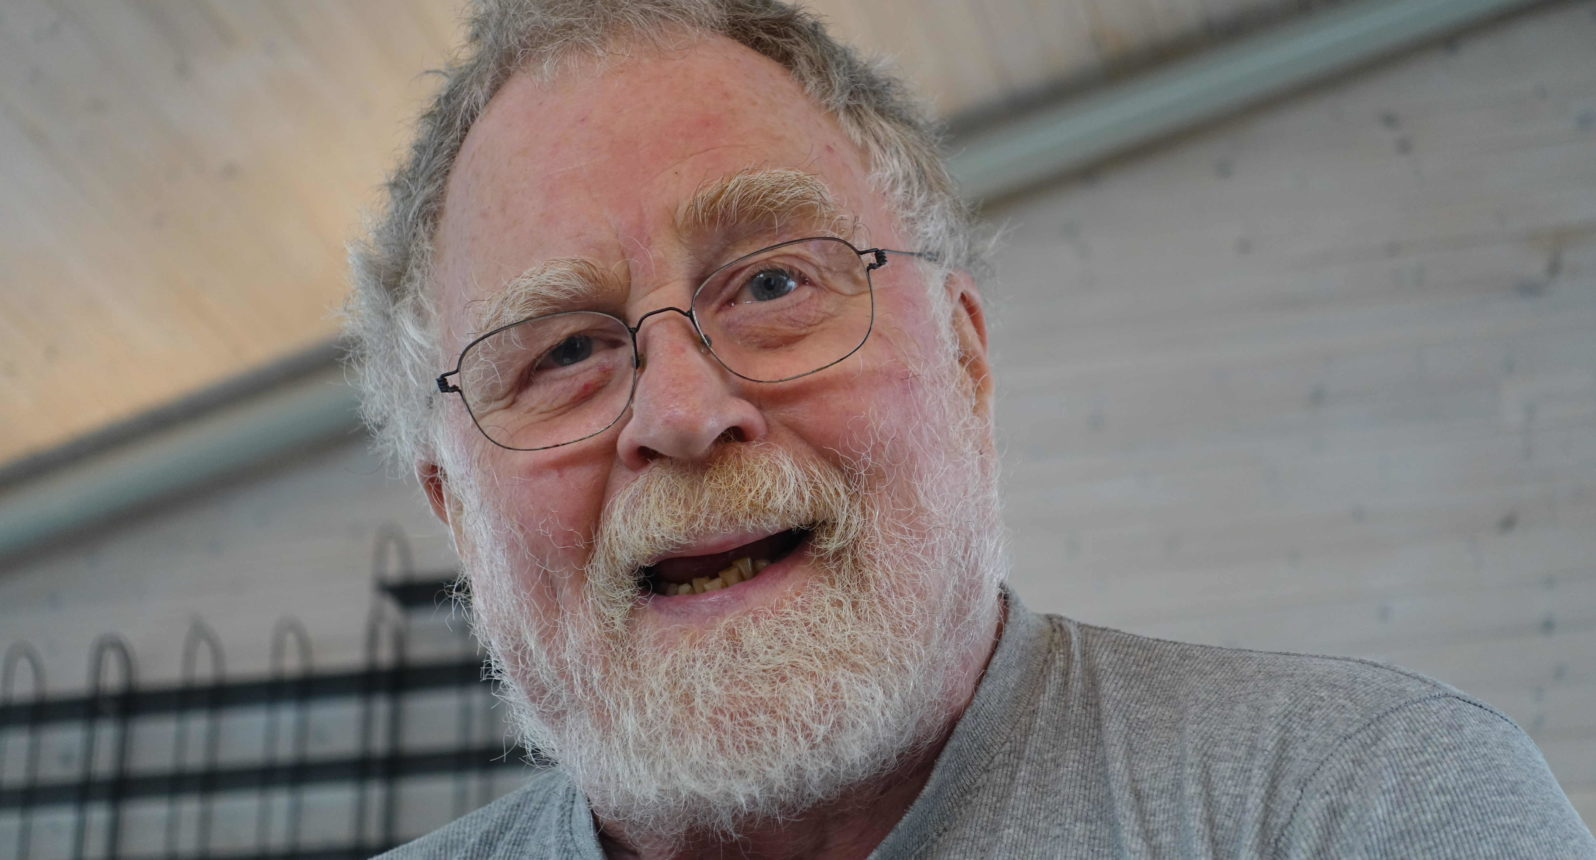 Komponisten Olav Anton Thommessen